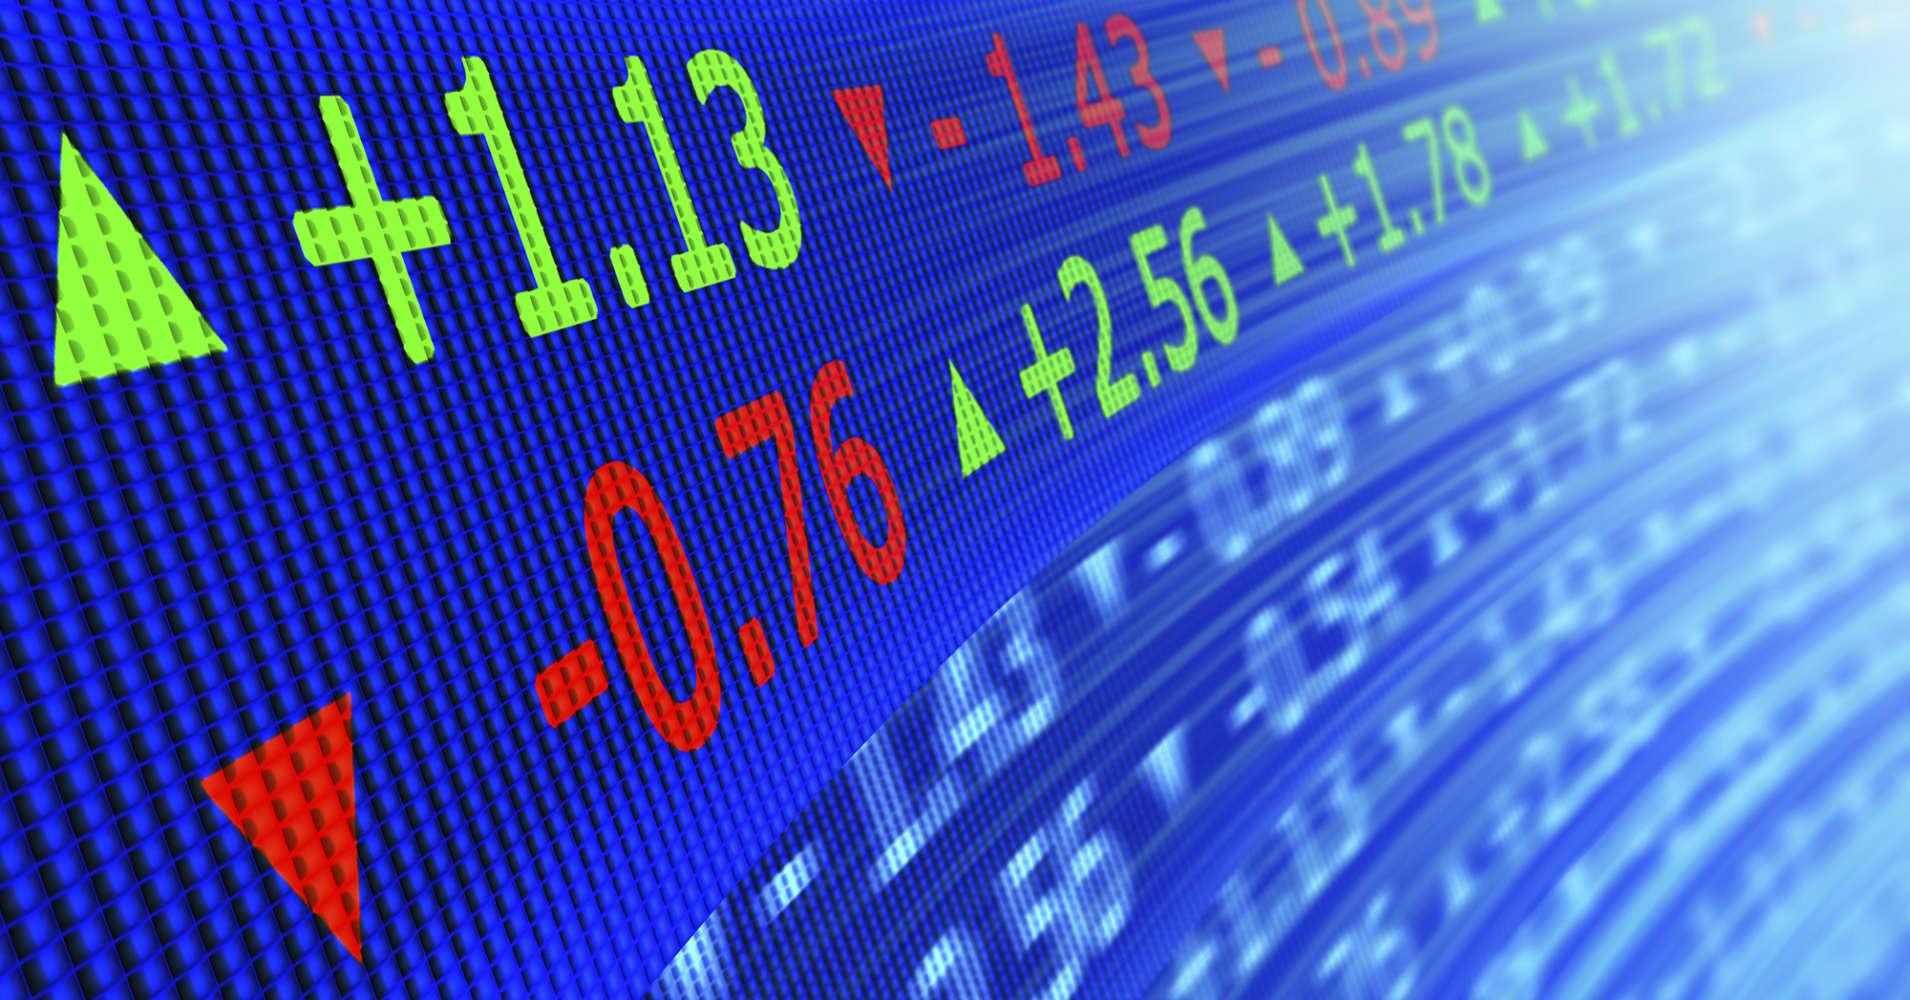 Stock market heroics - Bad for business?